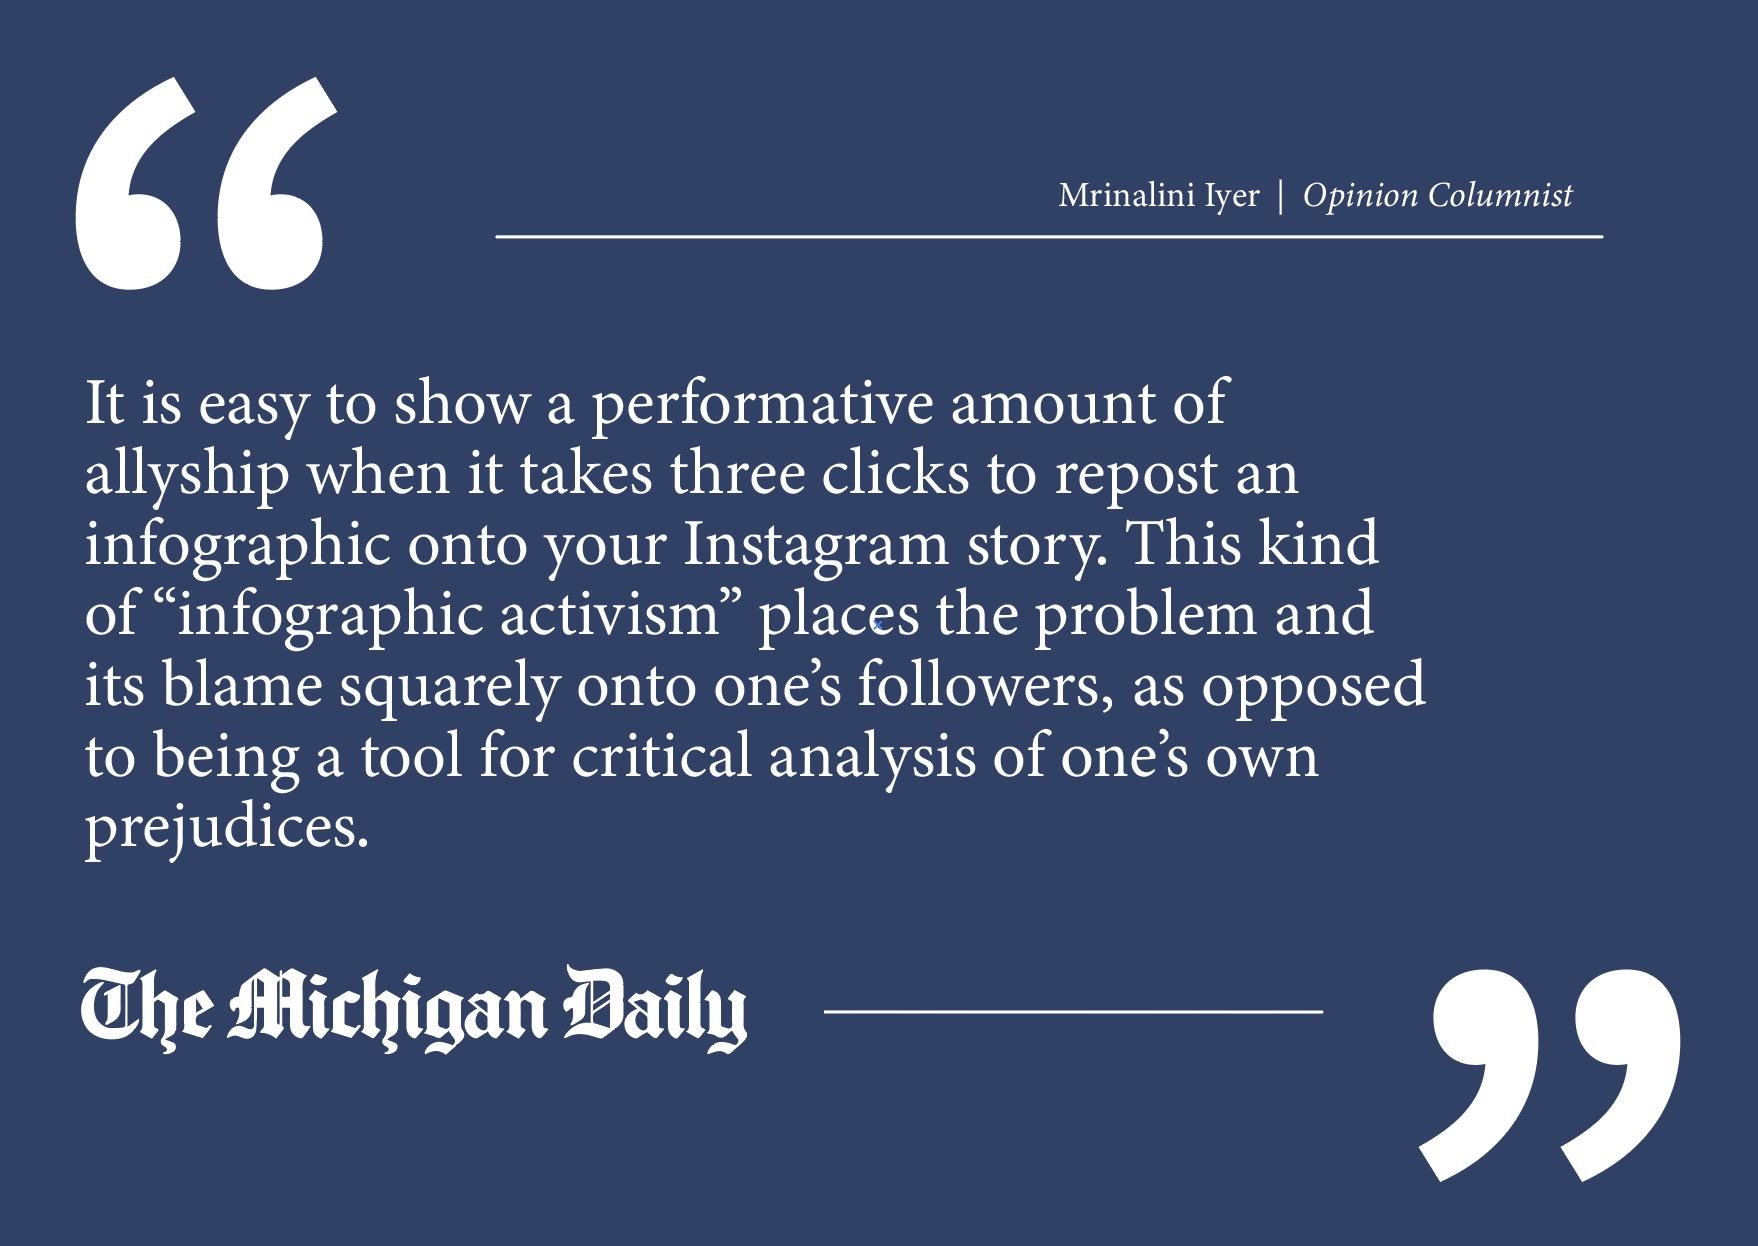 www.michigandaily.com: Make activism nuanced again